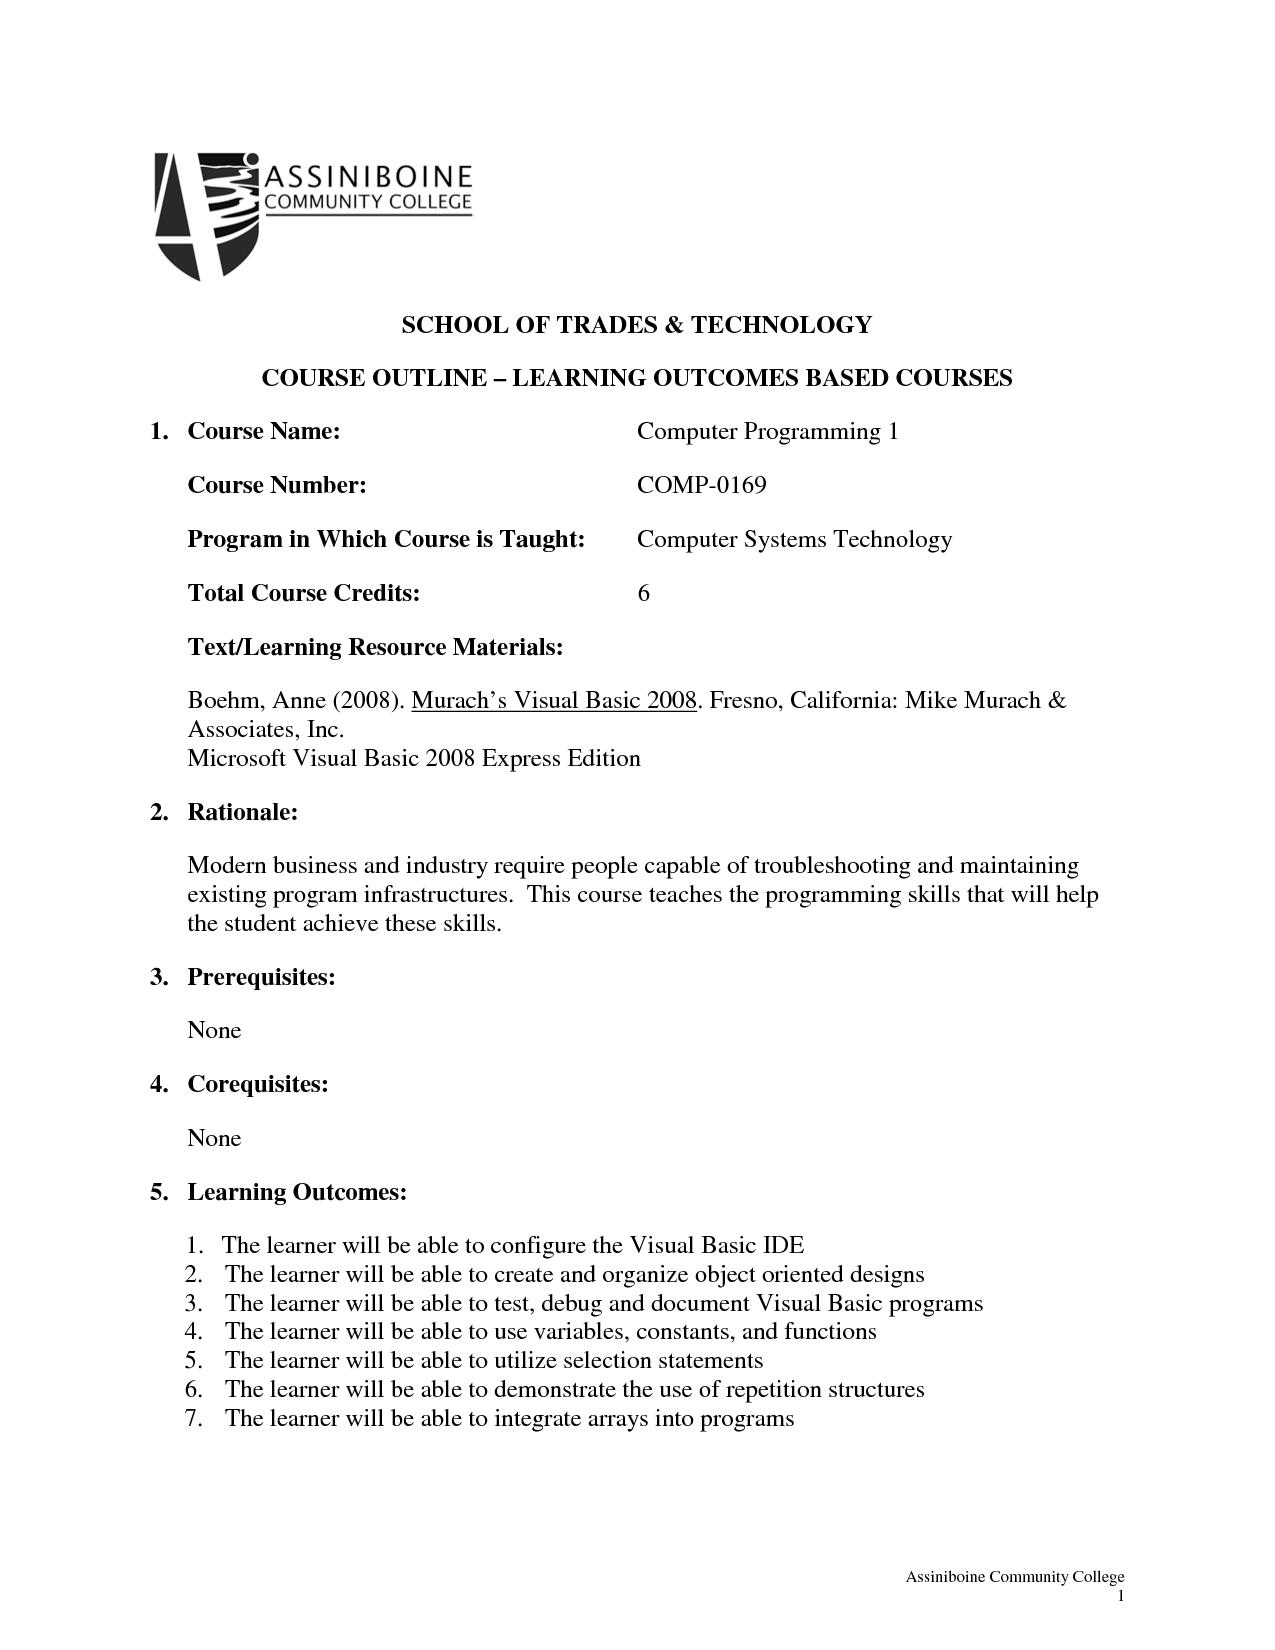 Bible Study Outline Blank Worksheet